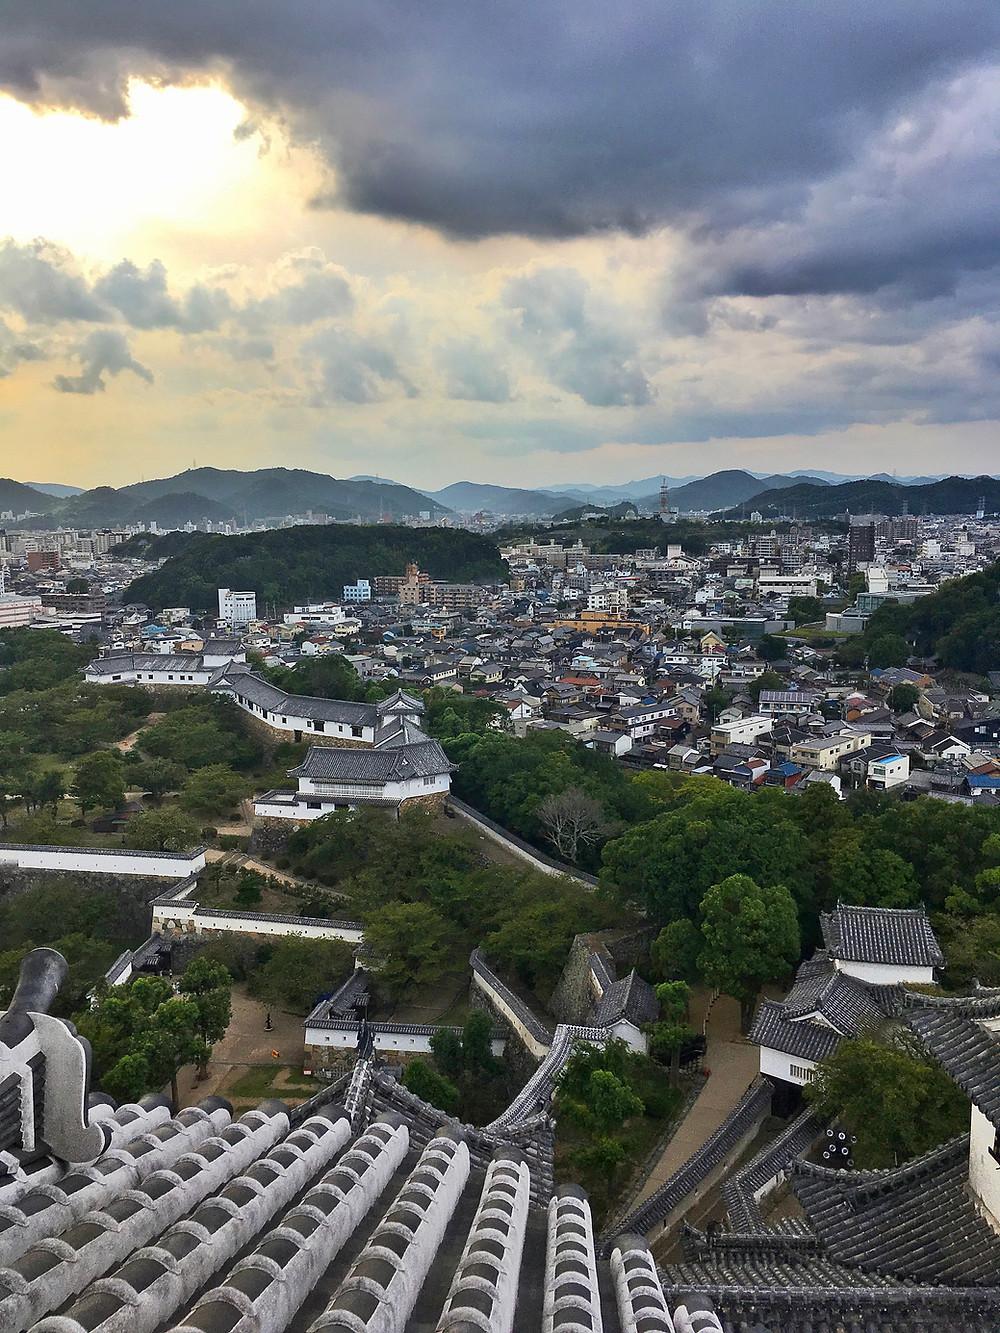 View from Himeji Castle in Japan